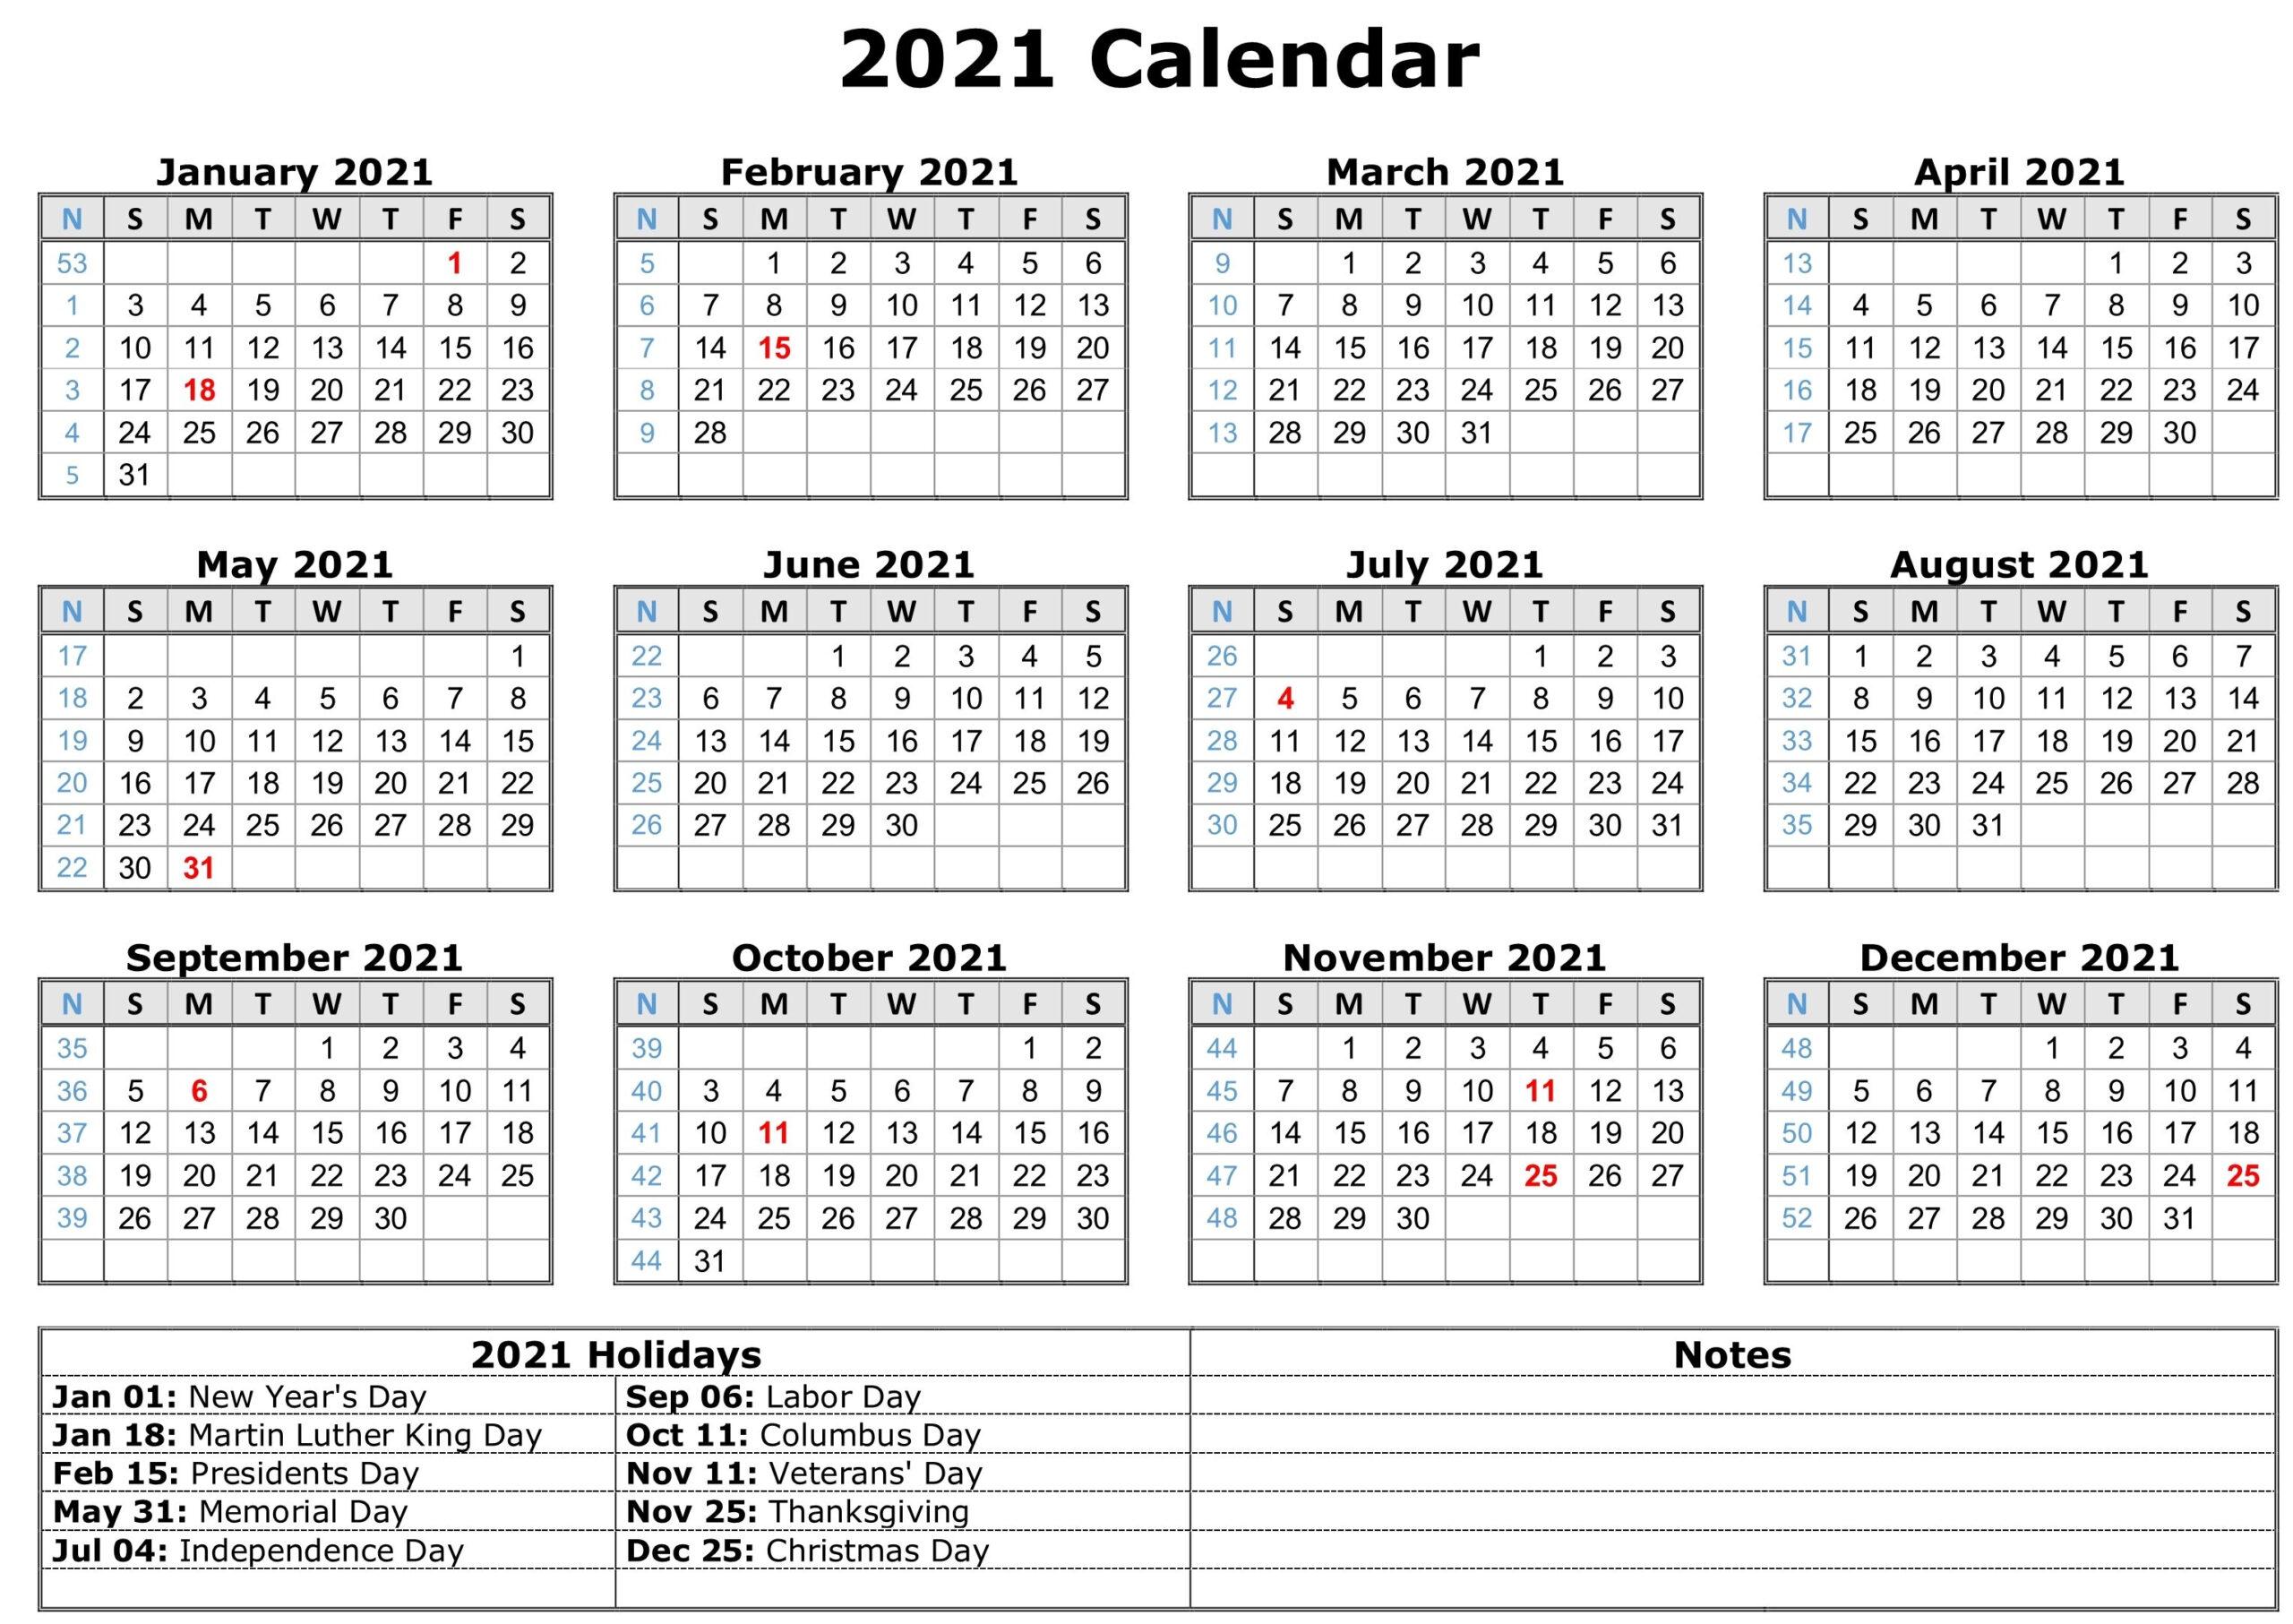 2021 Calendar With Holidays Printable Free